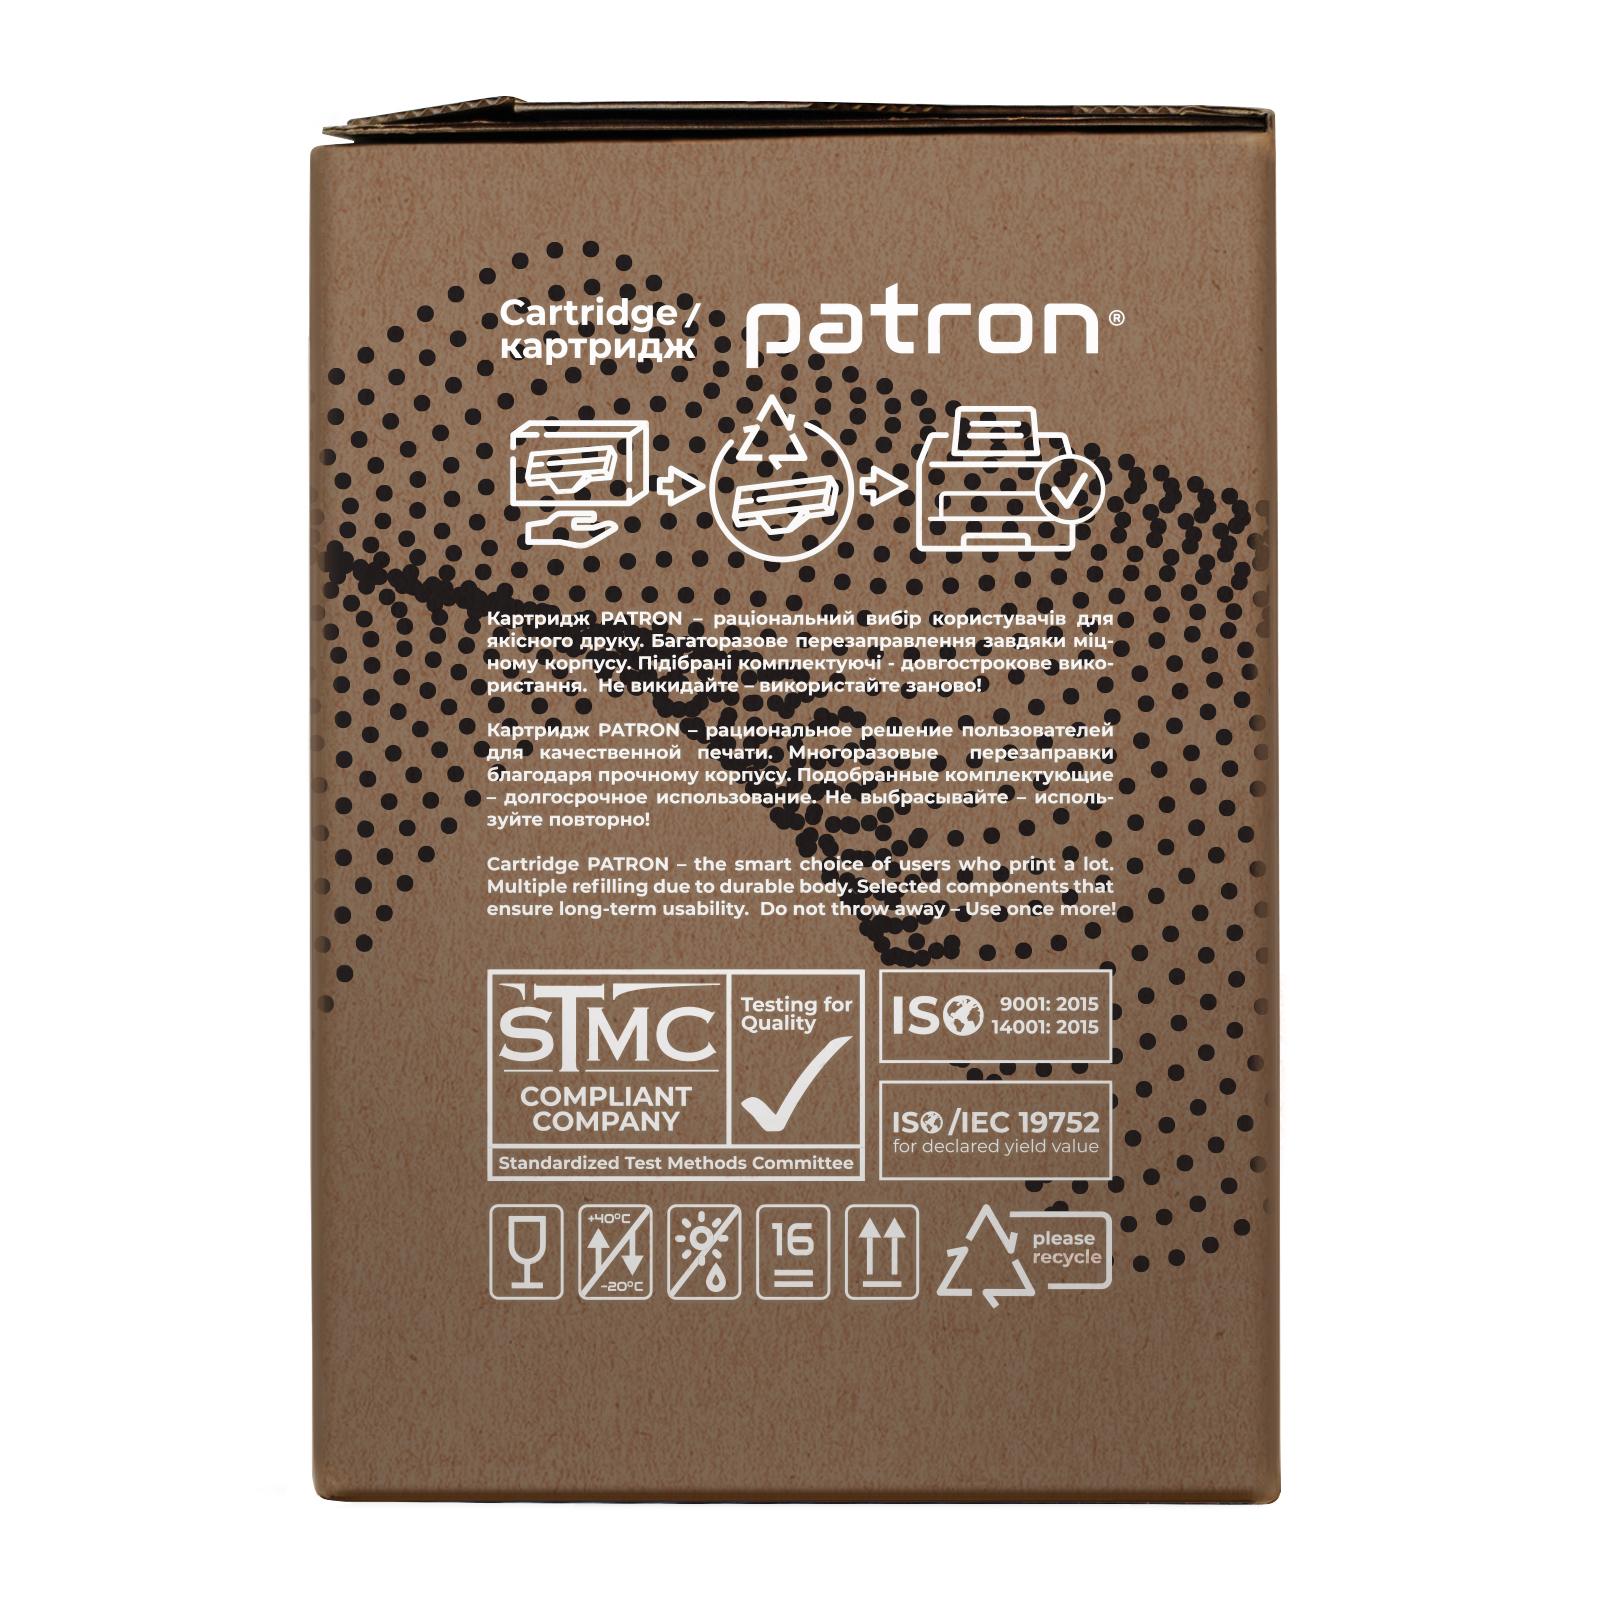 Картридж PATRON CANON 719H Extra (PN-719HR) (CT-CAN-719H-PN-R) изображение 4